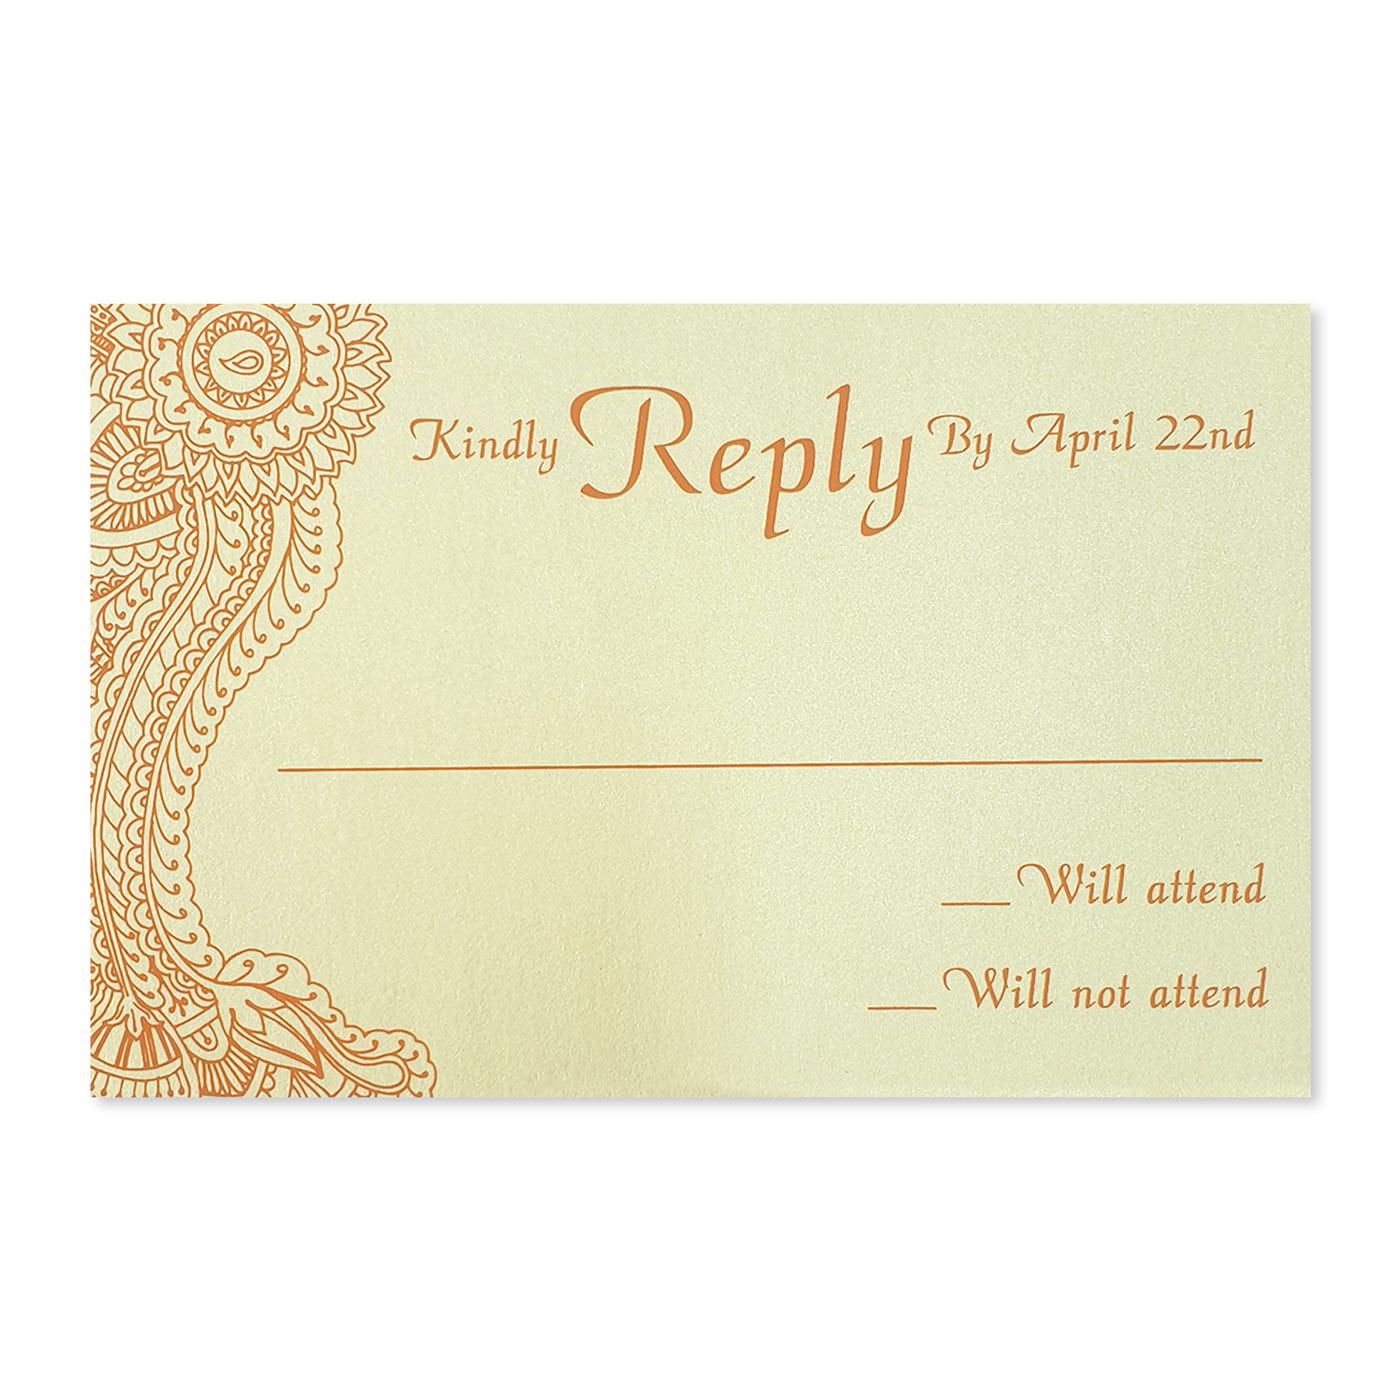 RSVP Cards : RSVP-ATOMIC_TANGERINE - 123WeddingCards